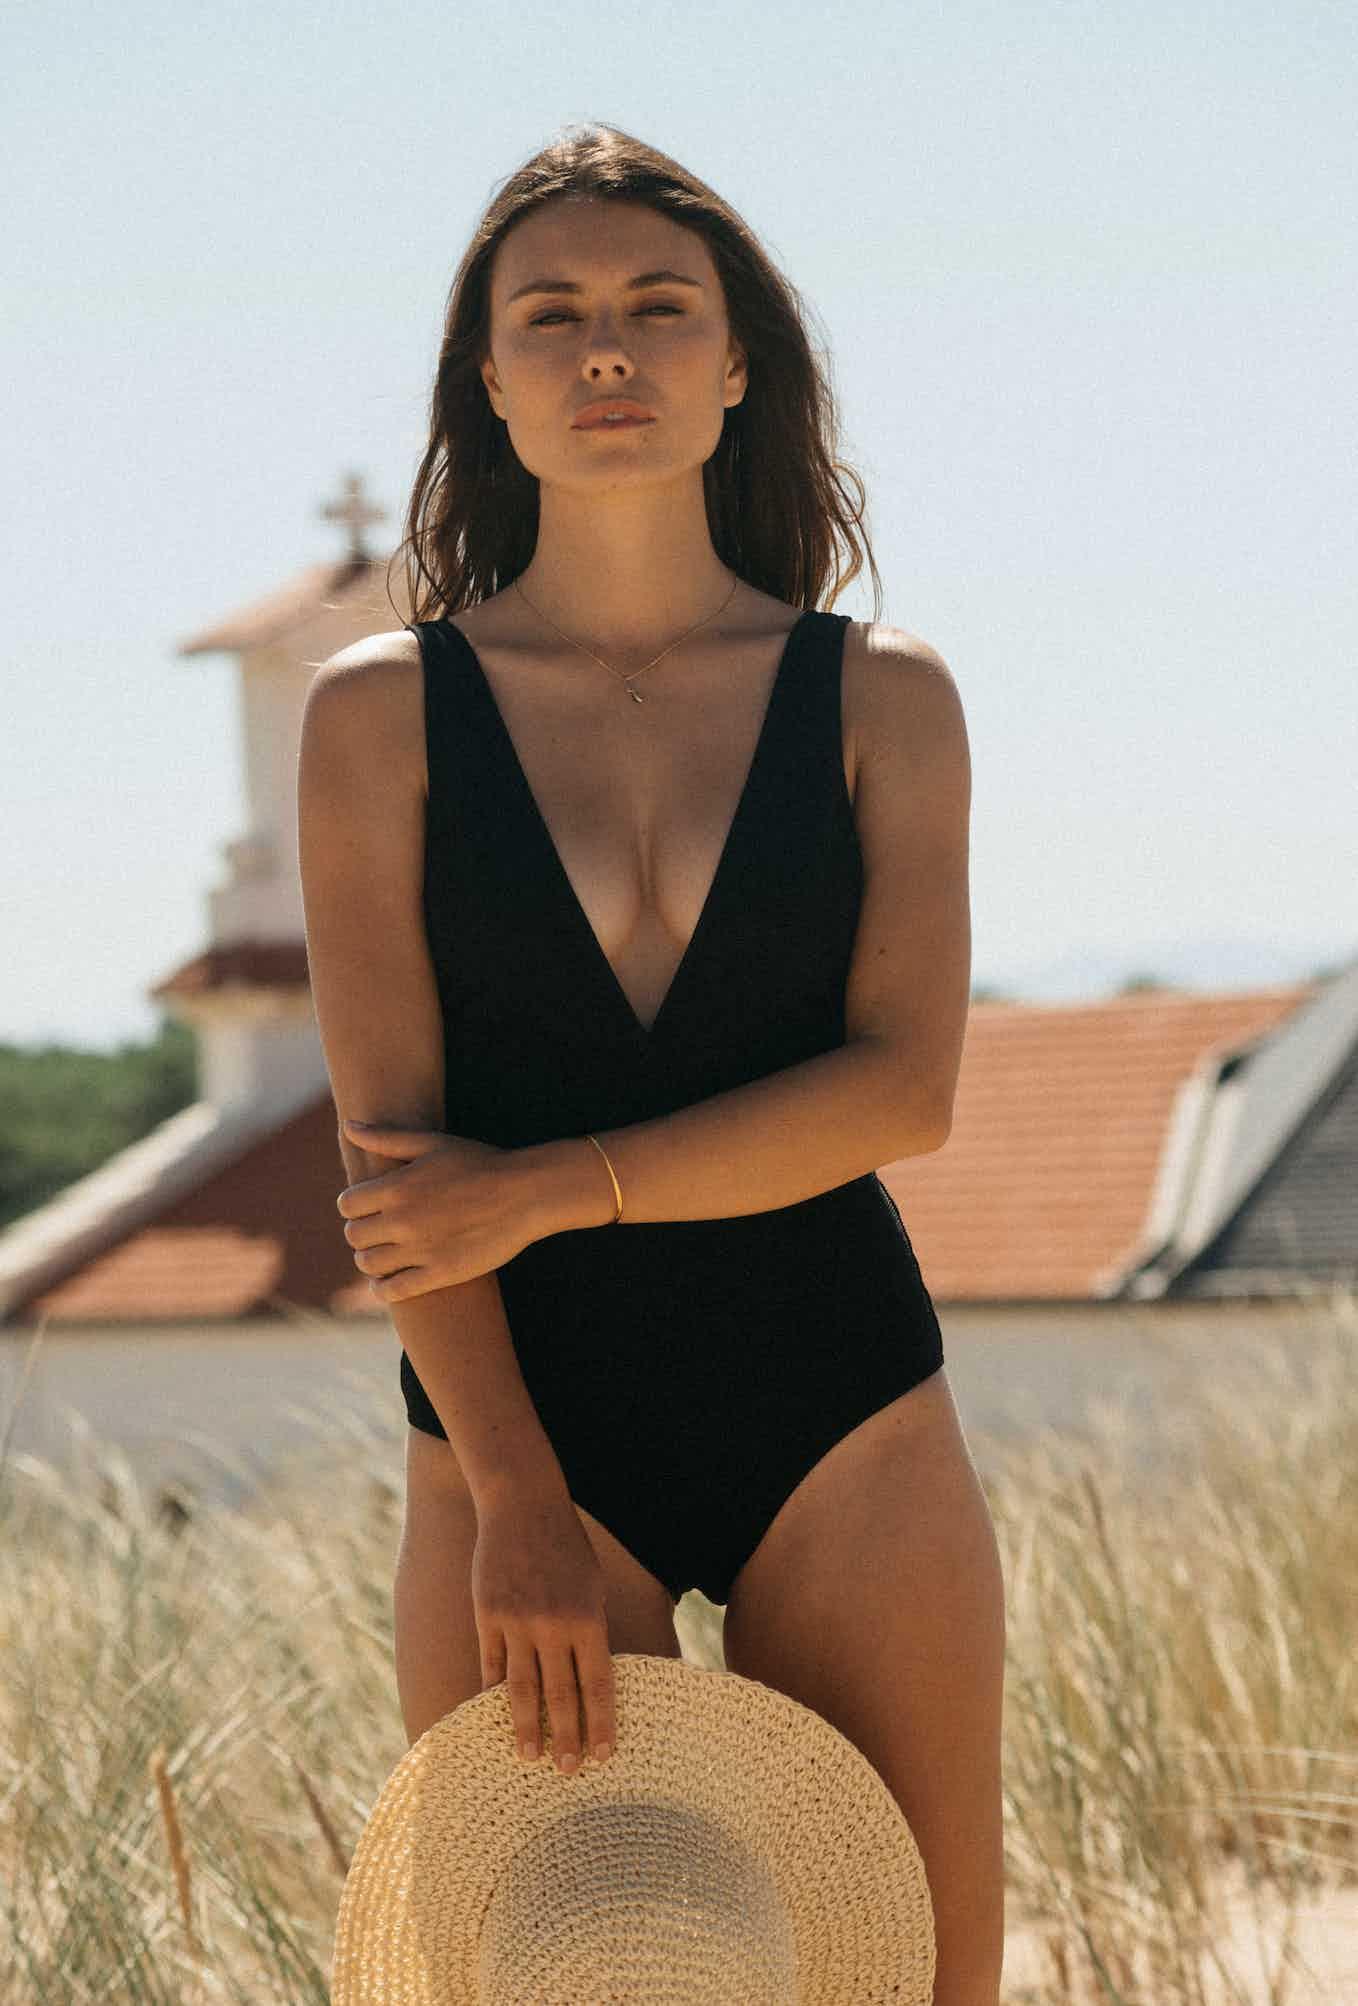 Paradis terrestre one piece swimsuit in black